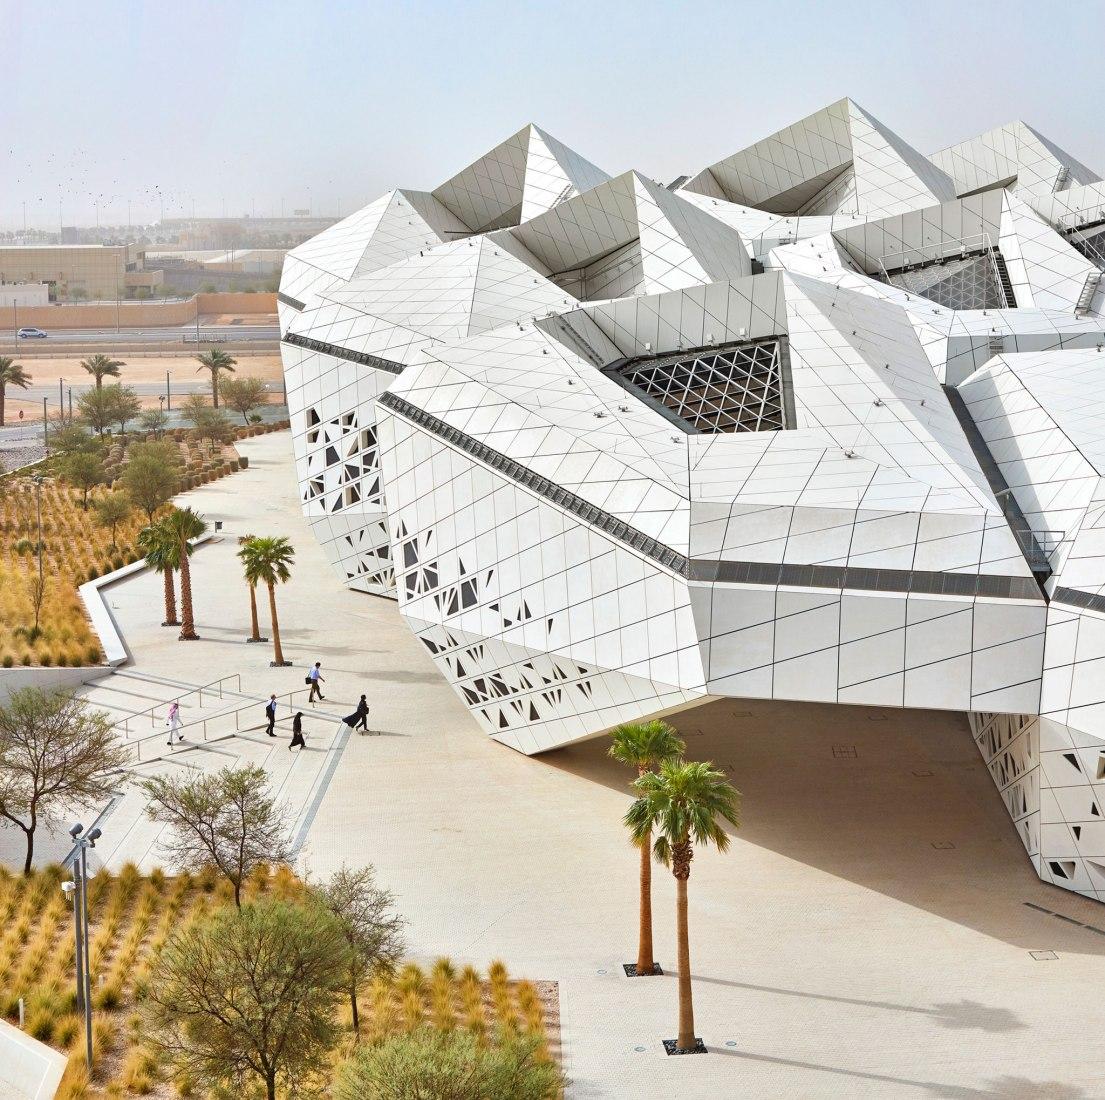 KAPSARC by Zaha Hadid Architects. Photography © Hufton + Crow